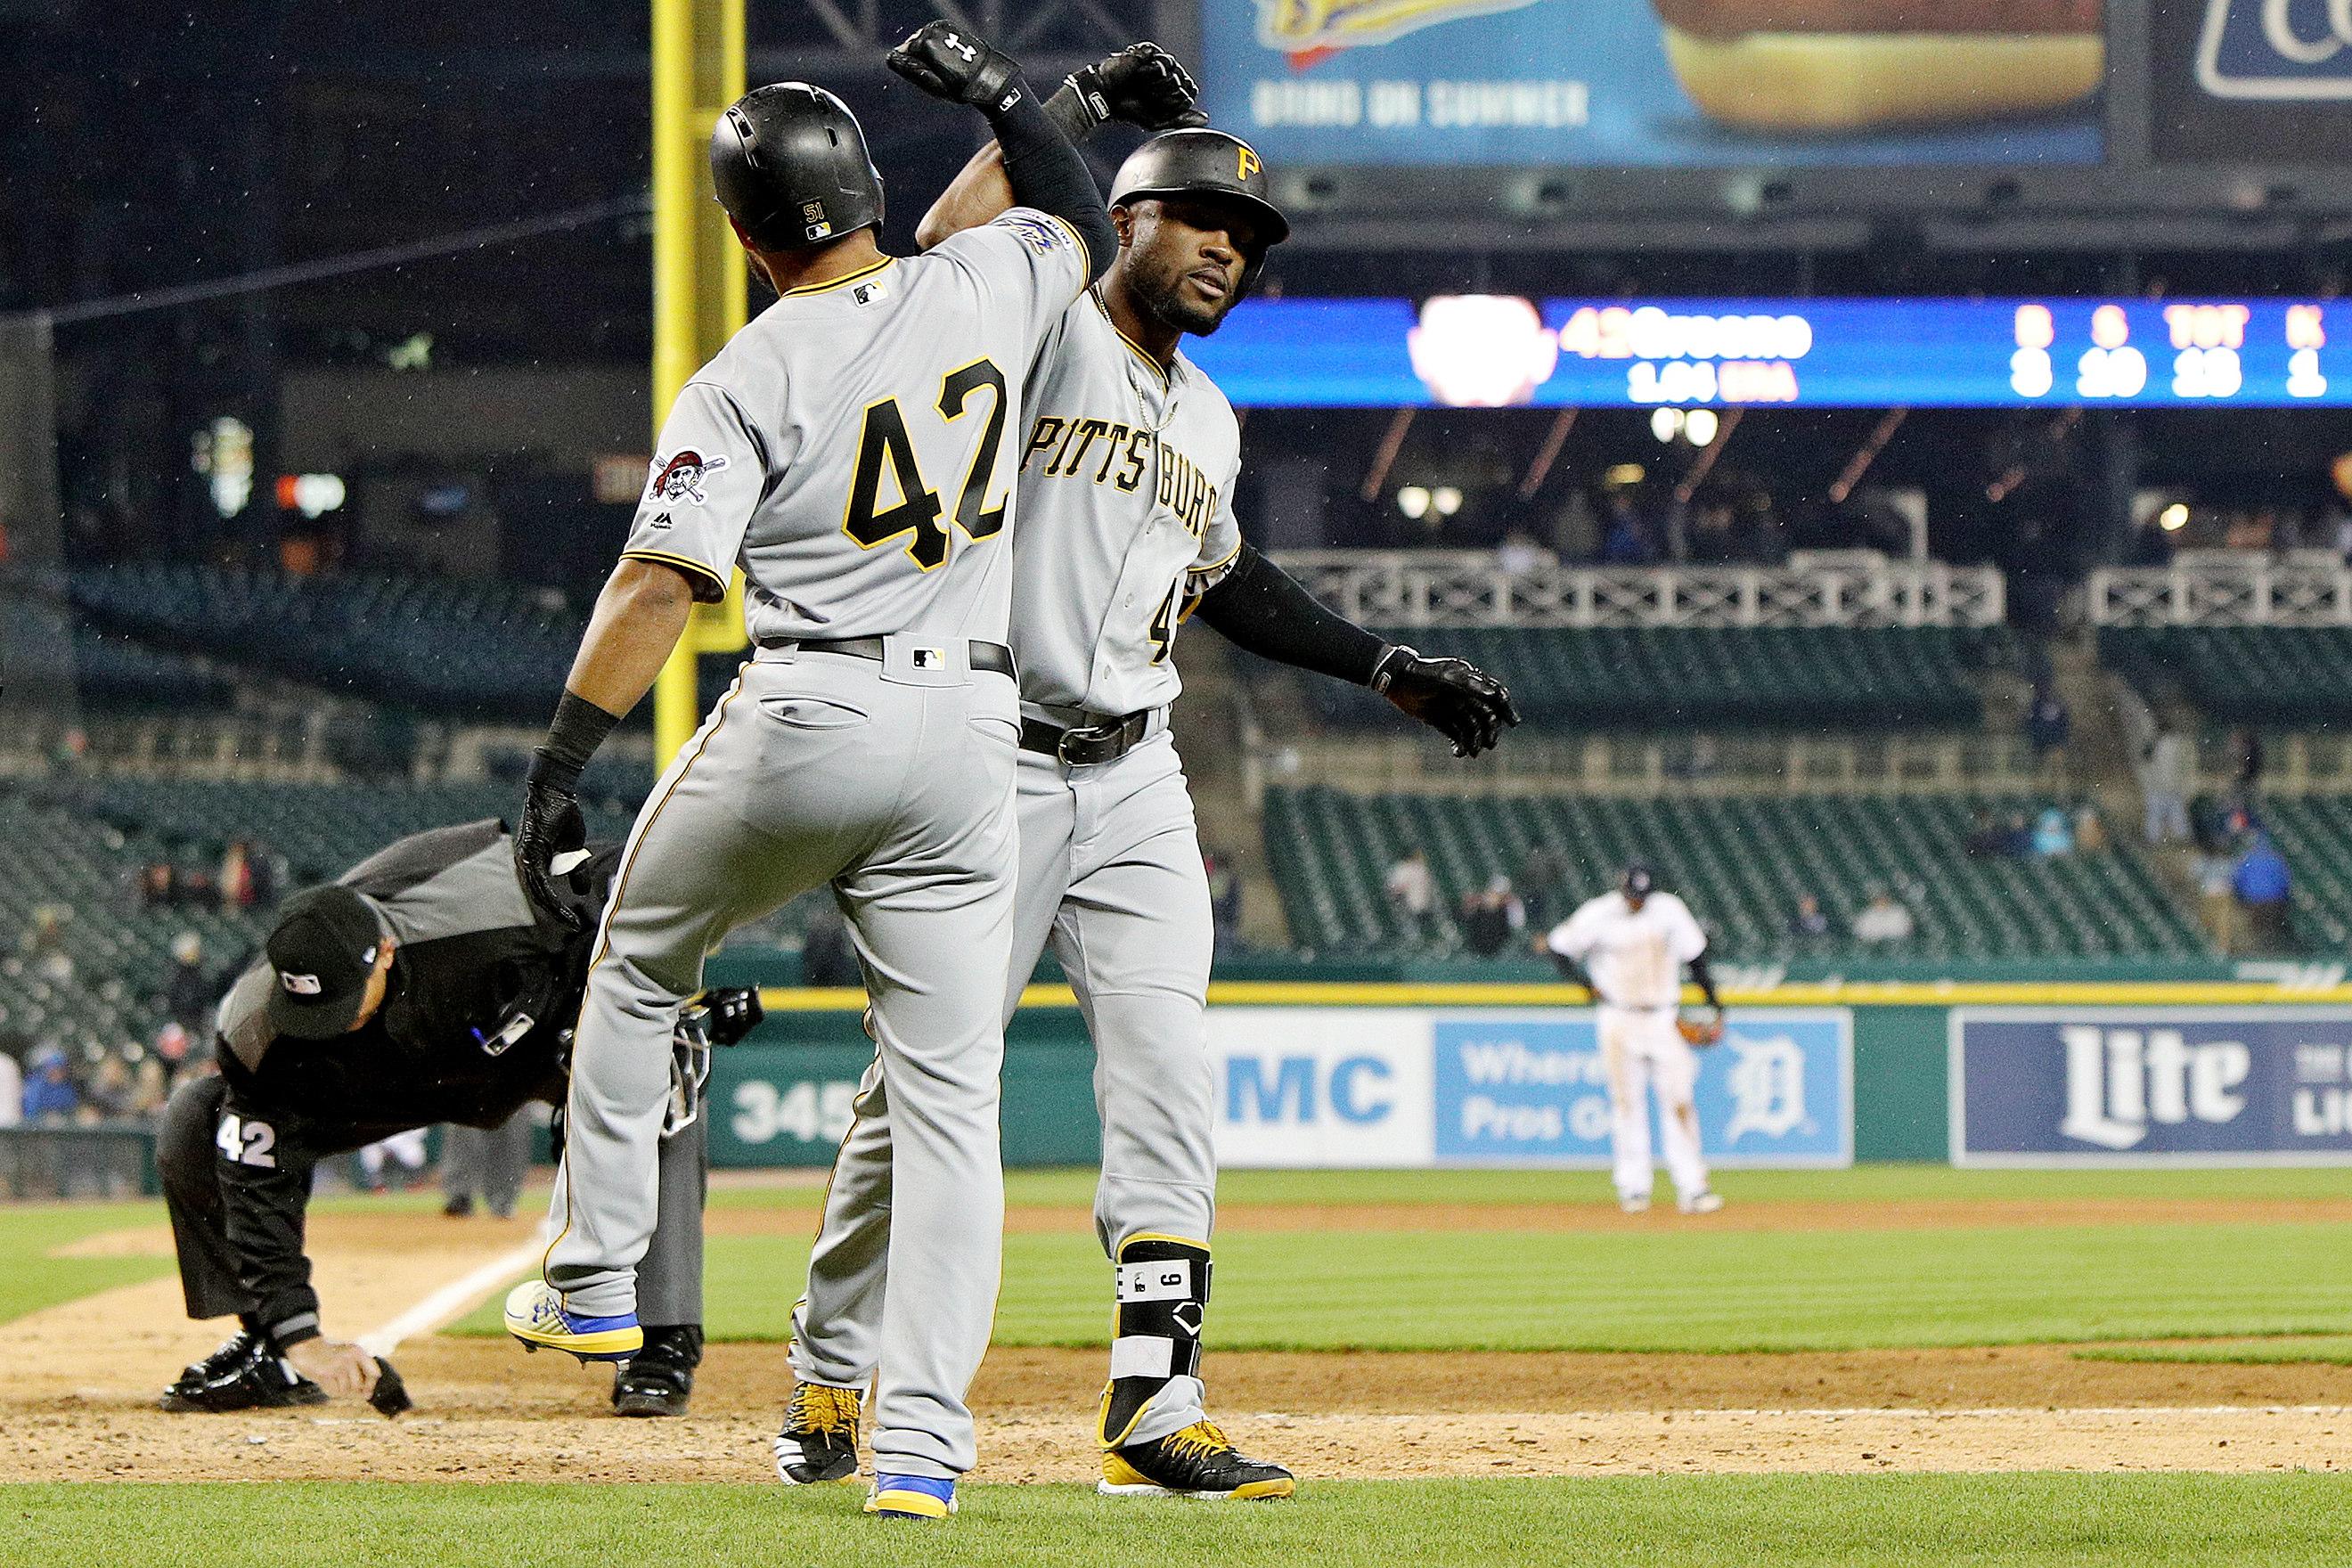 MLB rumors: Mets trading Brandon Nimmo for Pirates' Starling Marte?